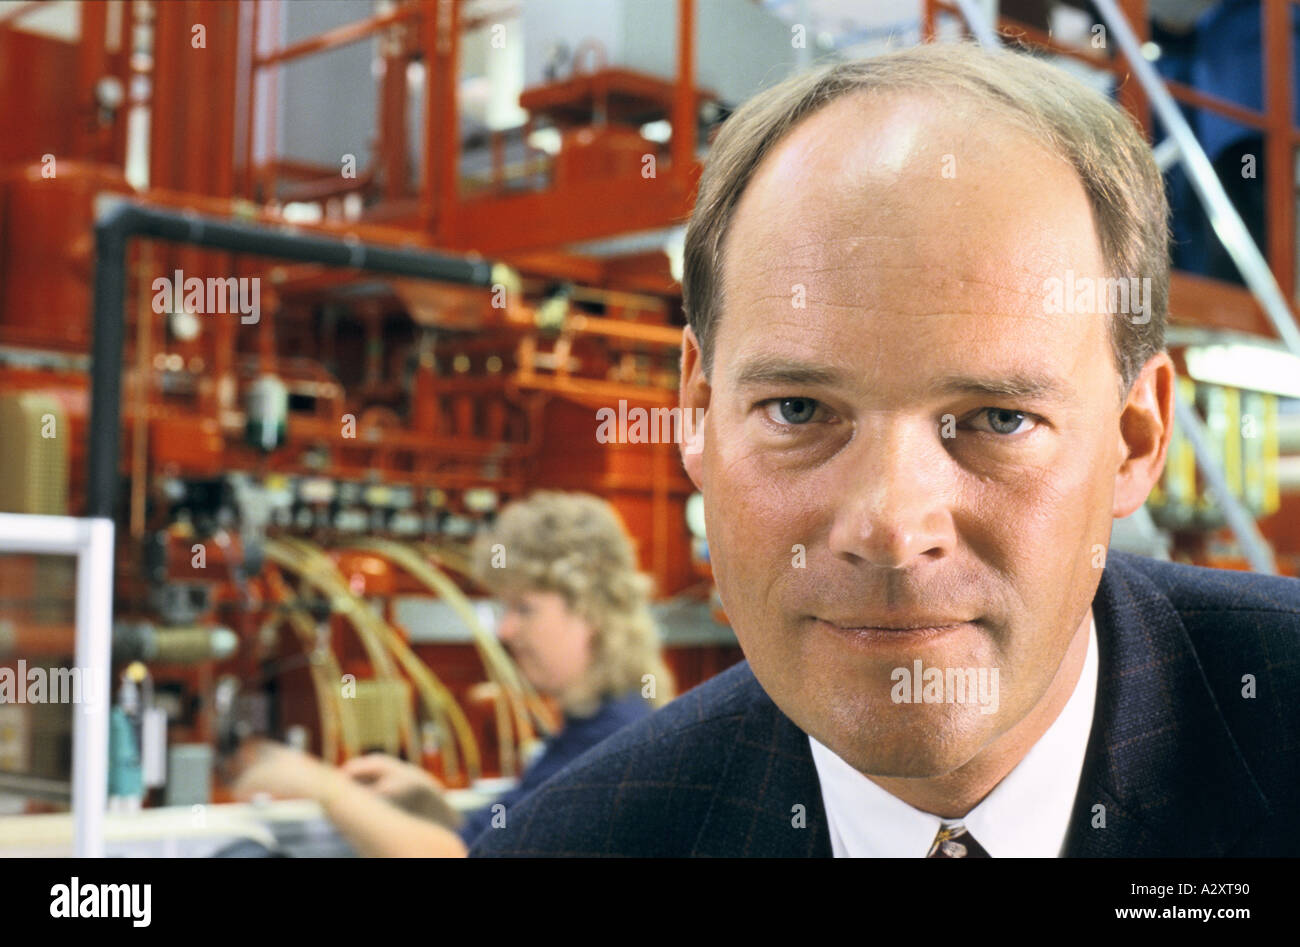 peter augustsson swedish businessman chairman skf gothnburg sweden - Stock Image